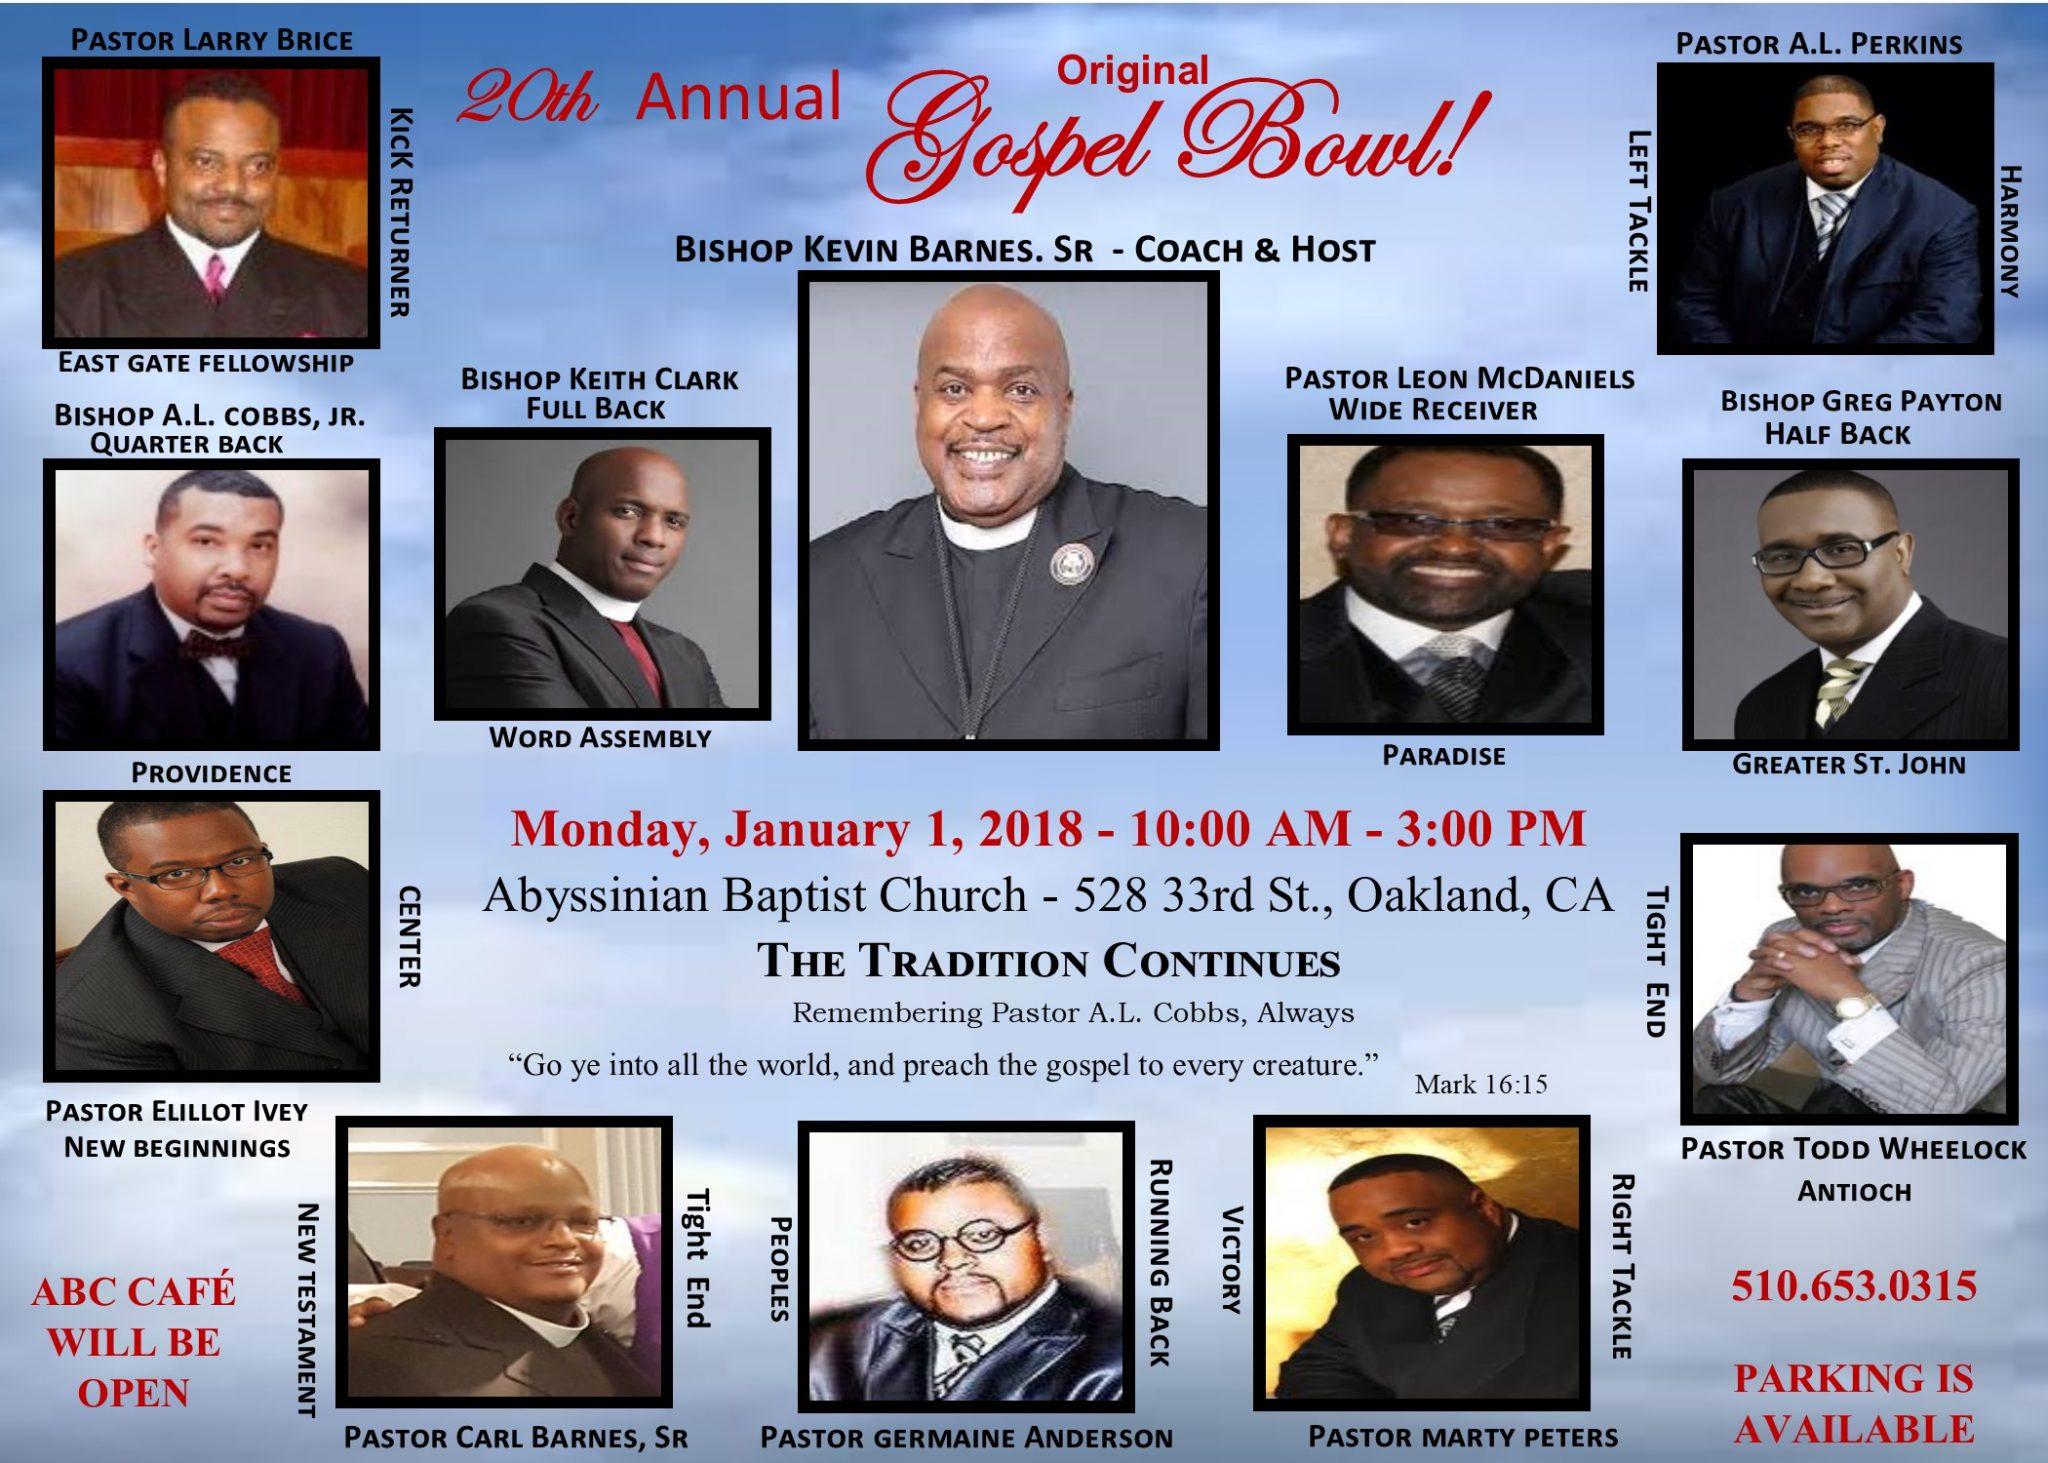 Gospel Bowl 2018